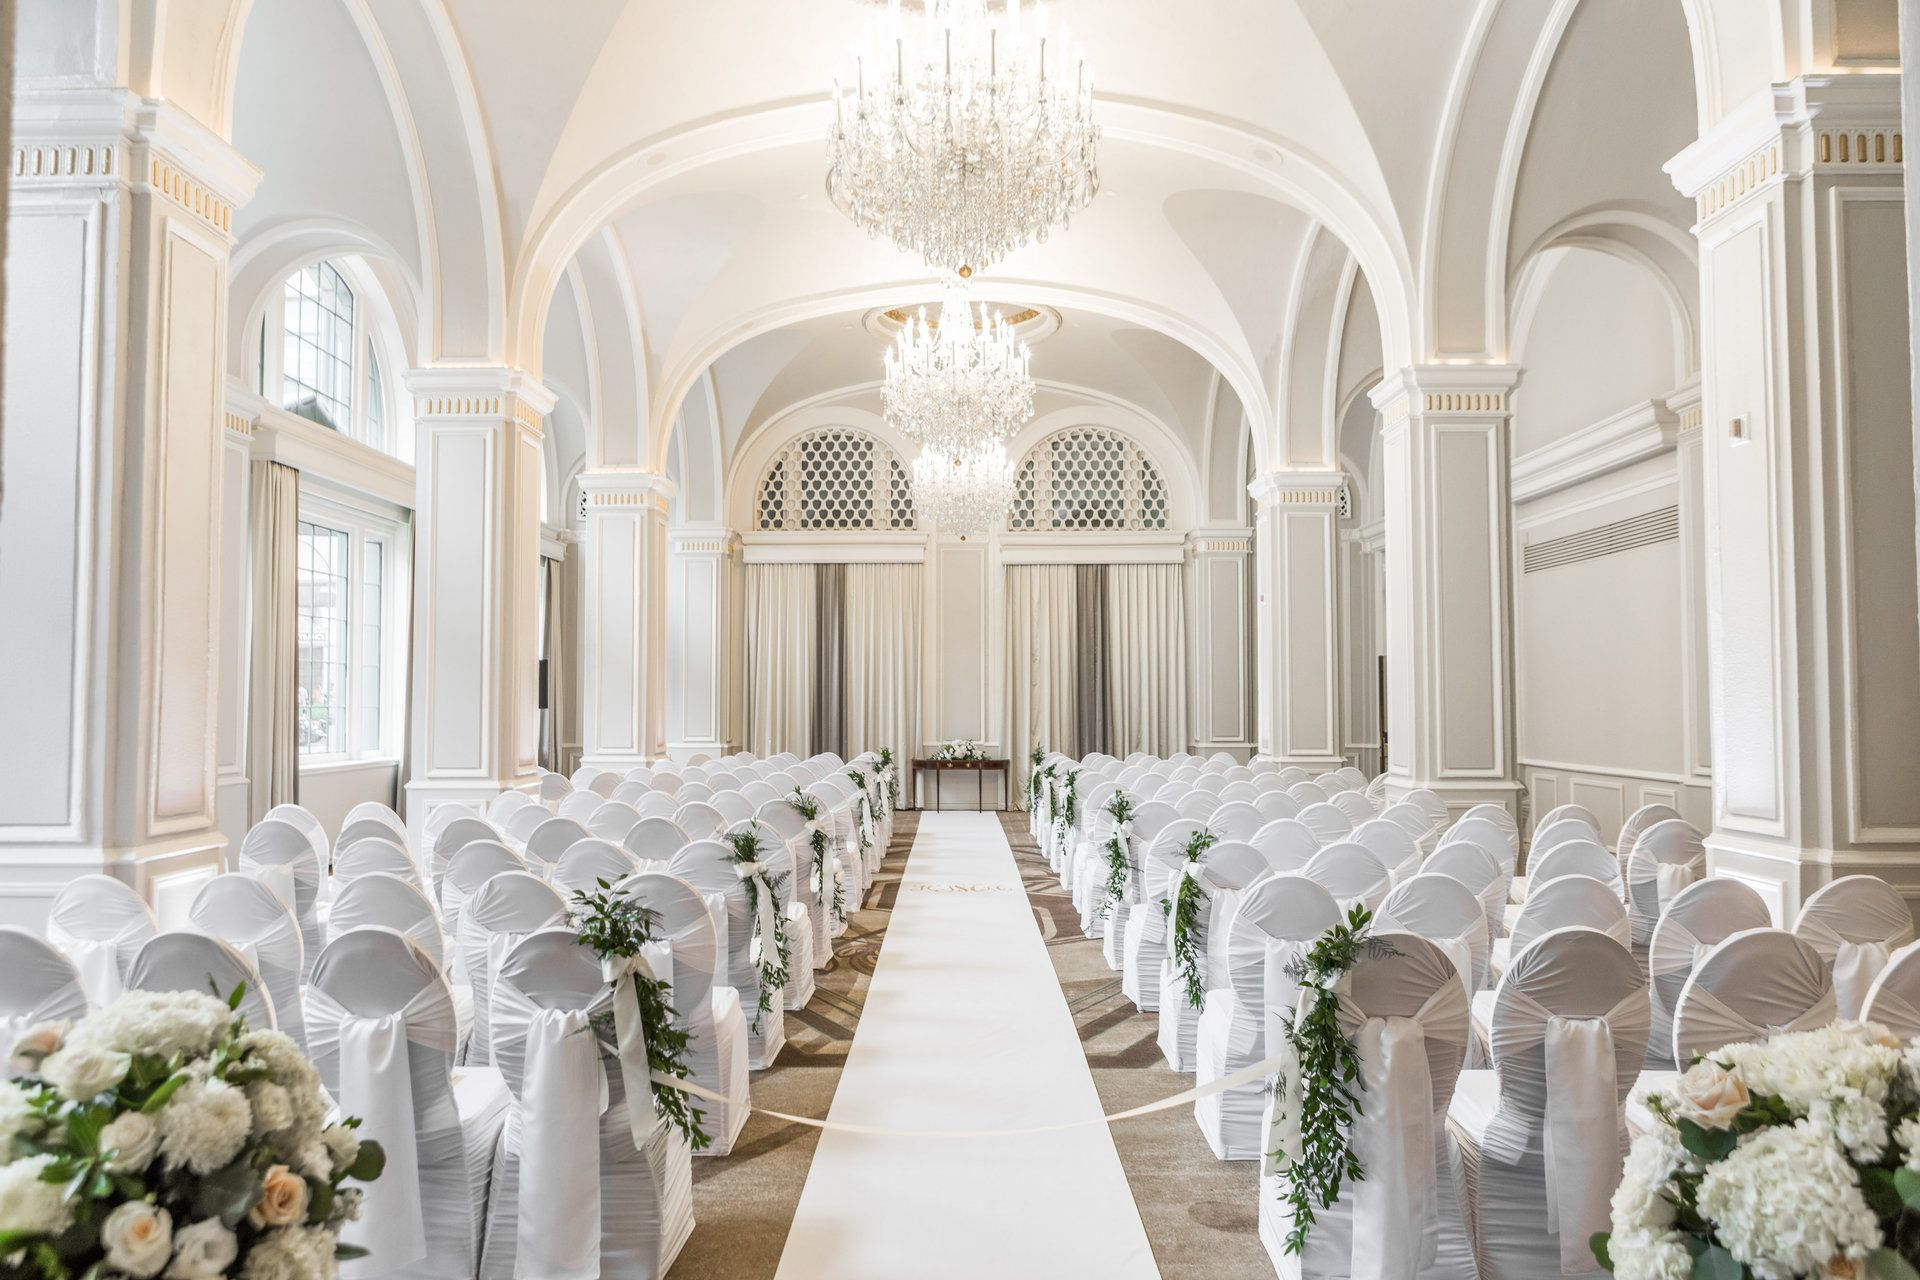 The Smarter Way to Wed | Indoor ceremony, Wedding ceremony ideas and ...